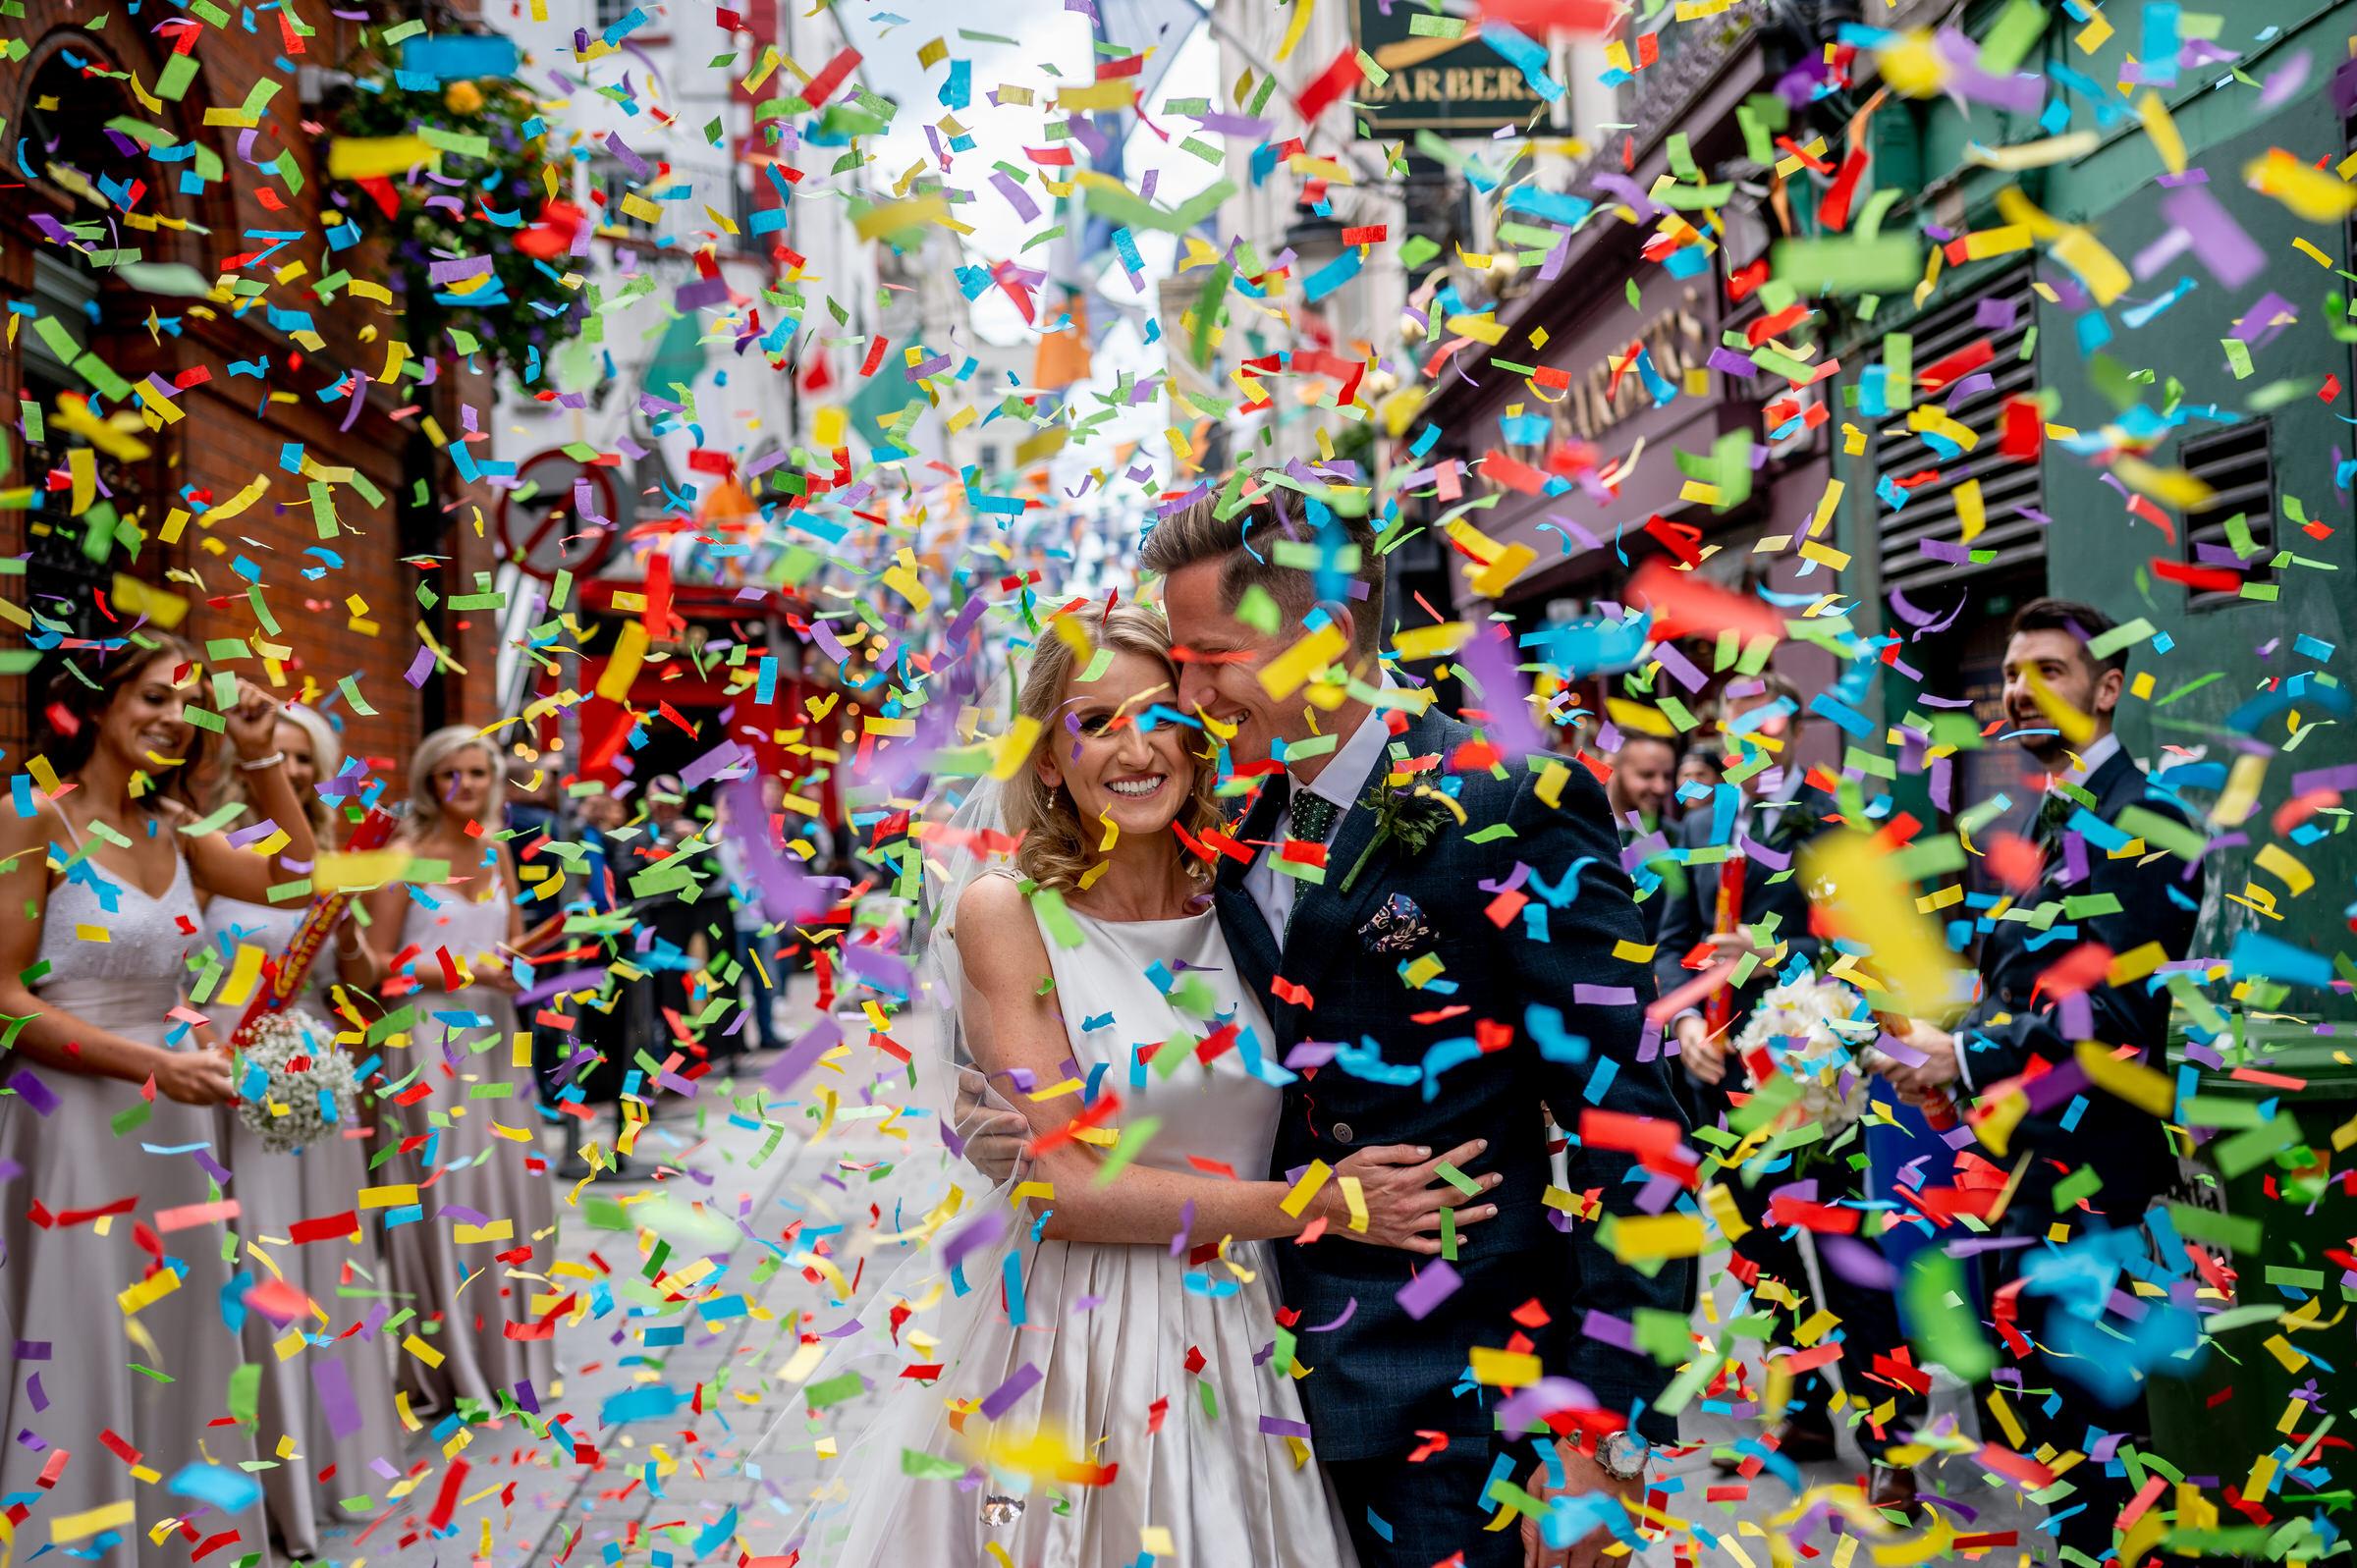 couple-exit-amid-big-colorful-confetti-john-gillooley